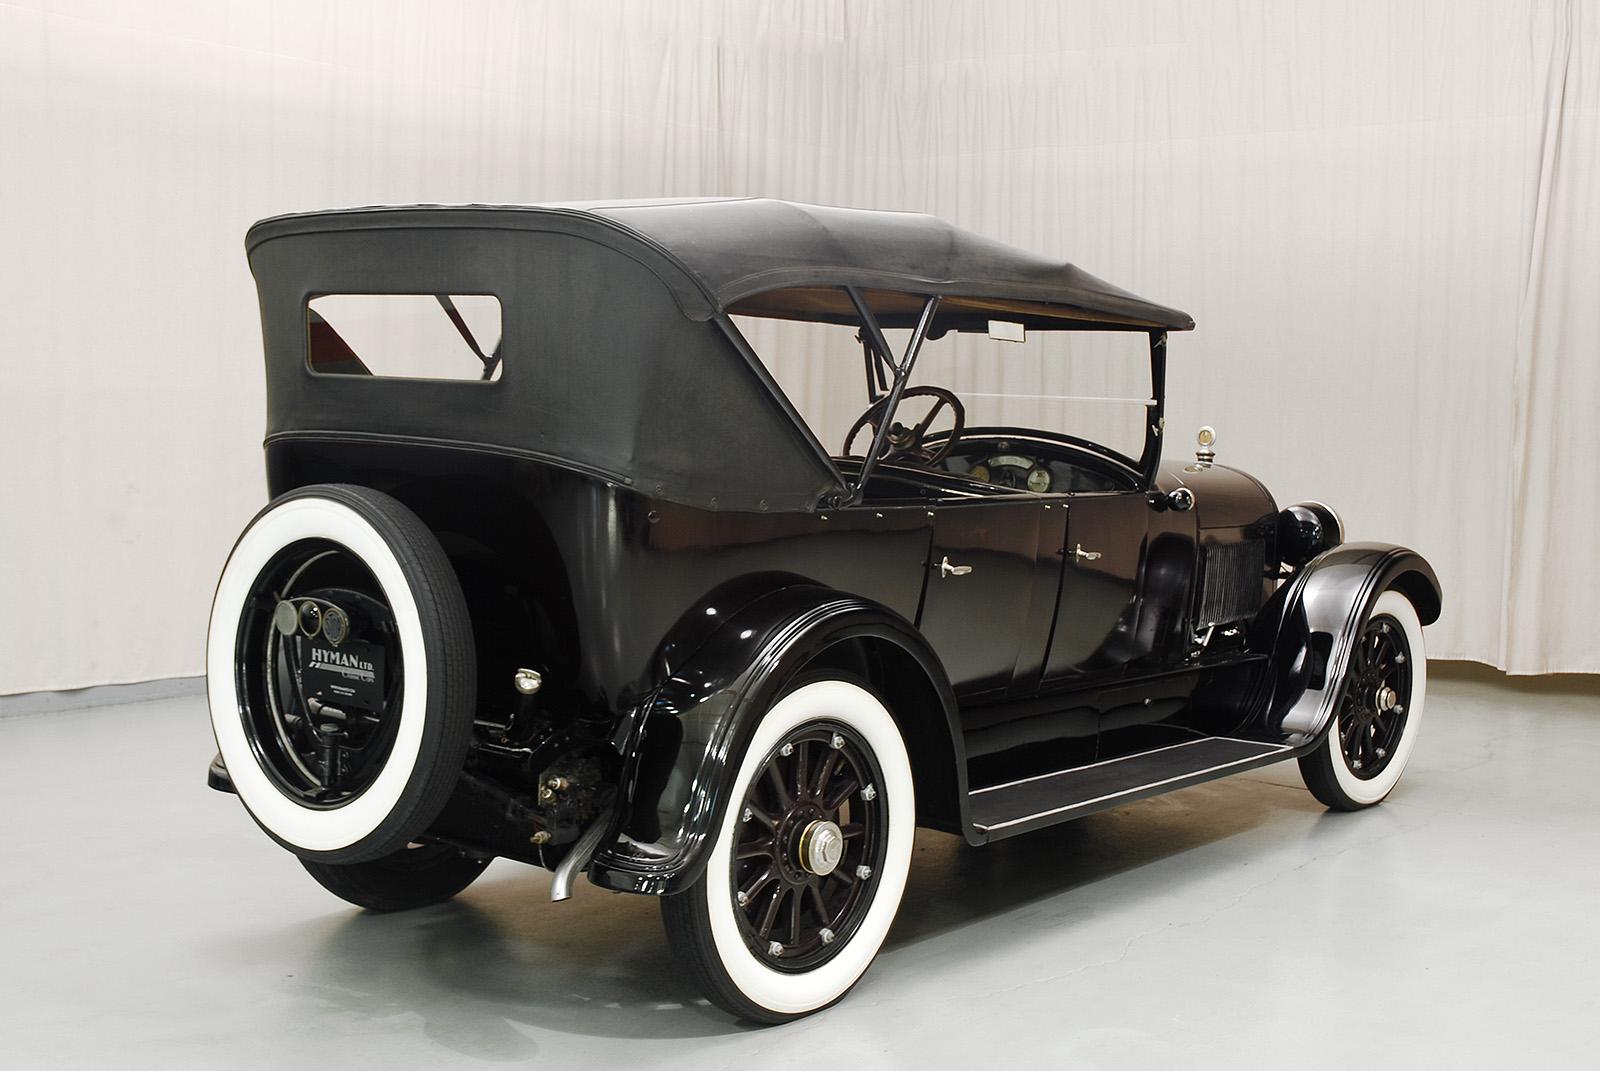 1924 Cadillac Type V-63 Touring | Classic Cars | Hyman LTD